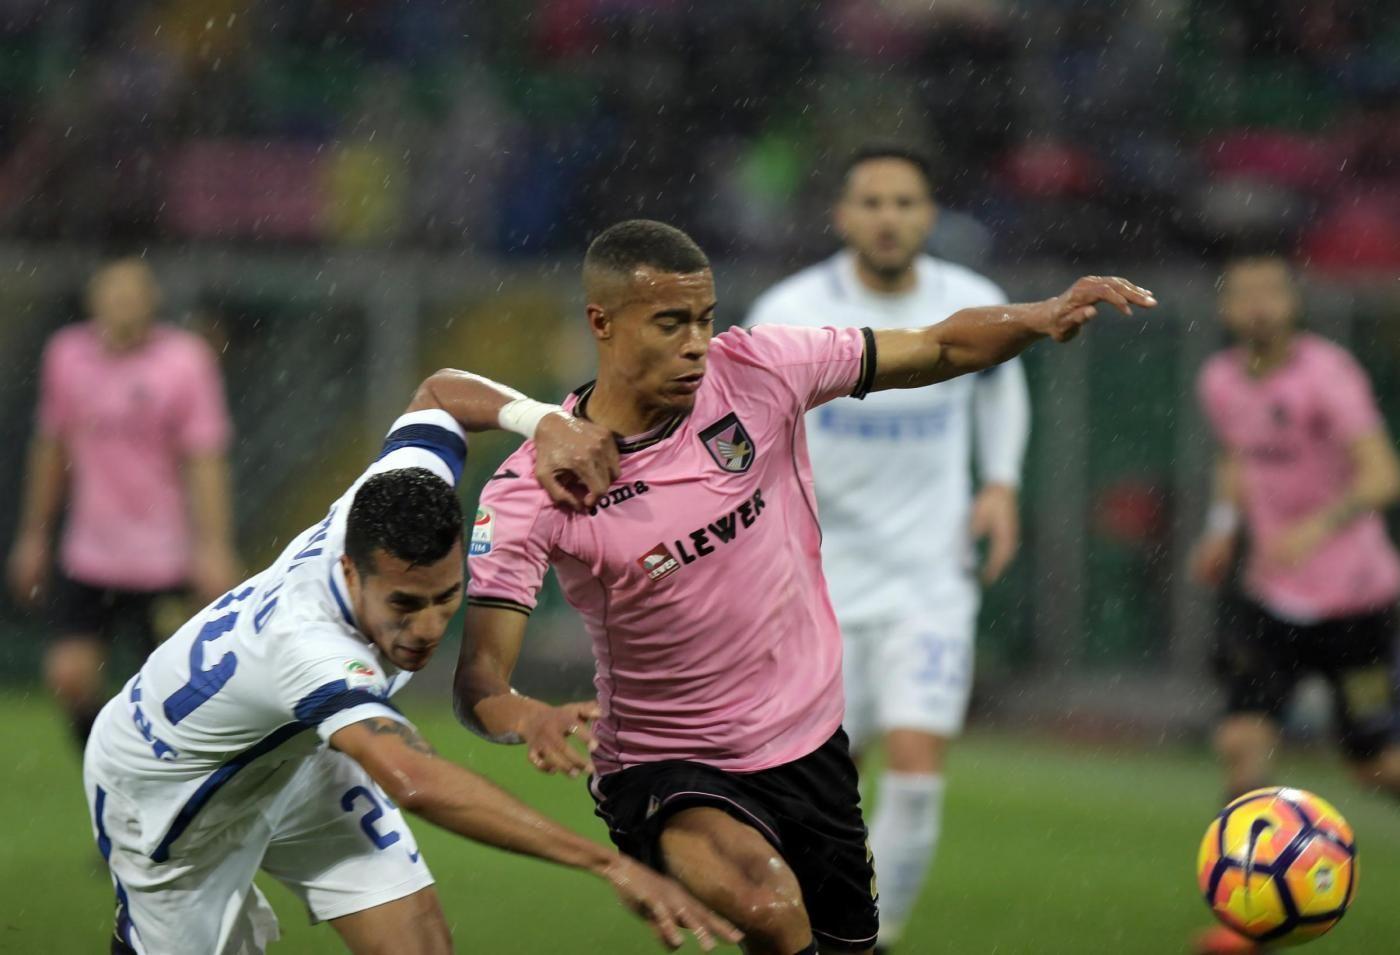 Palermo Inter Serie A Tim 2016/2017